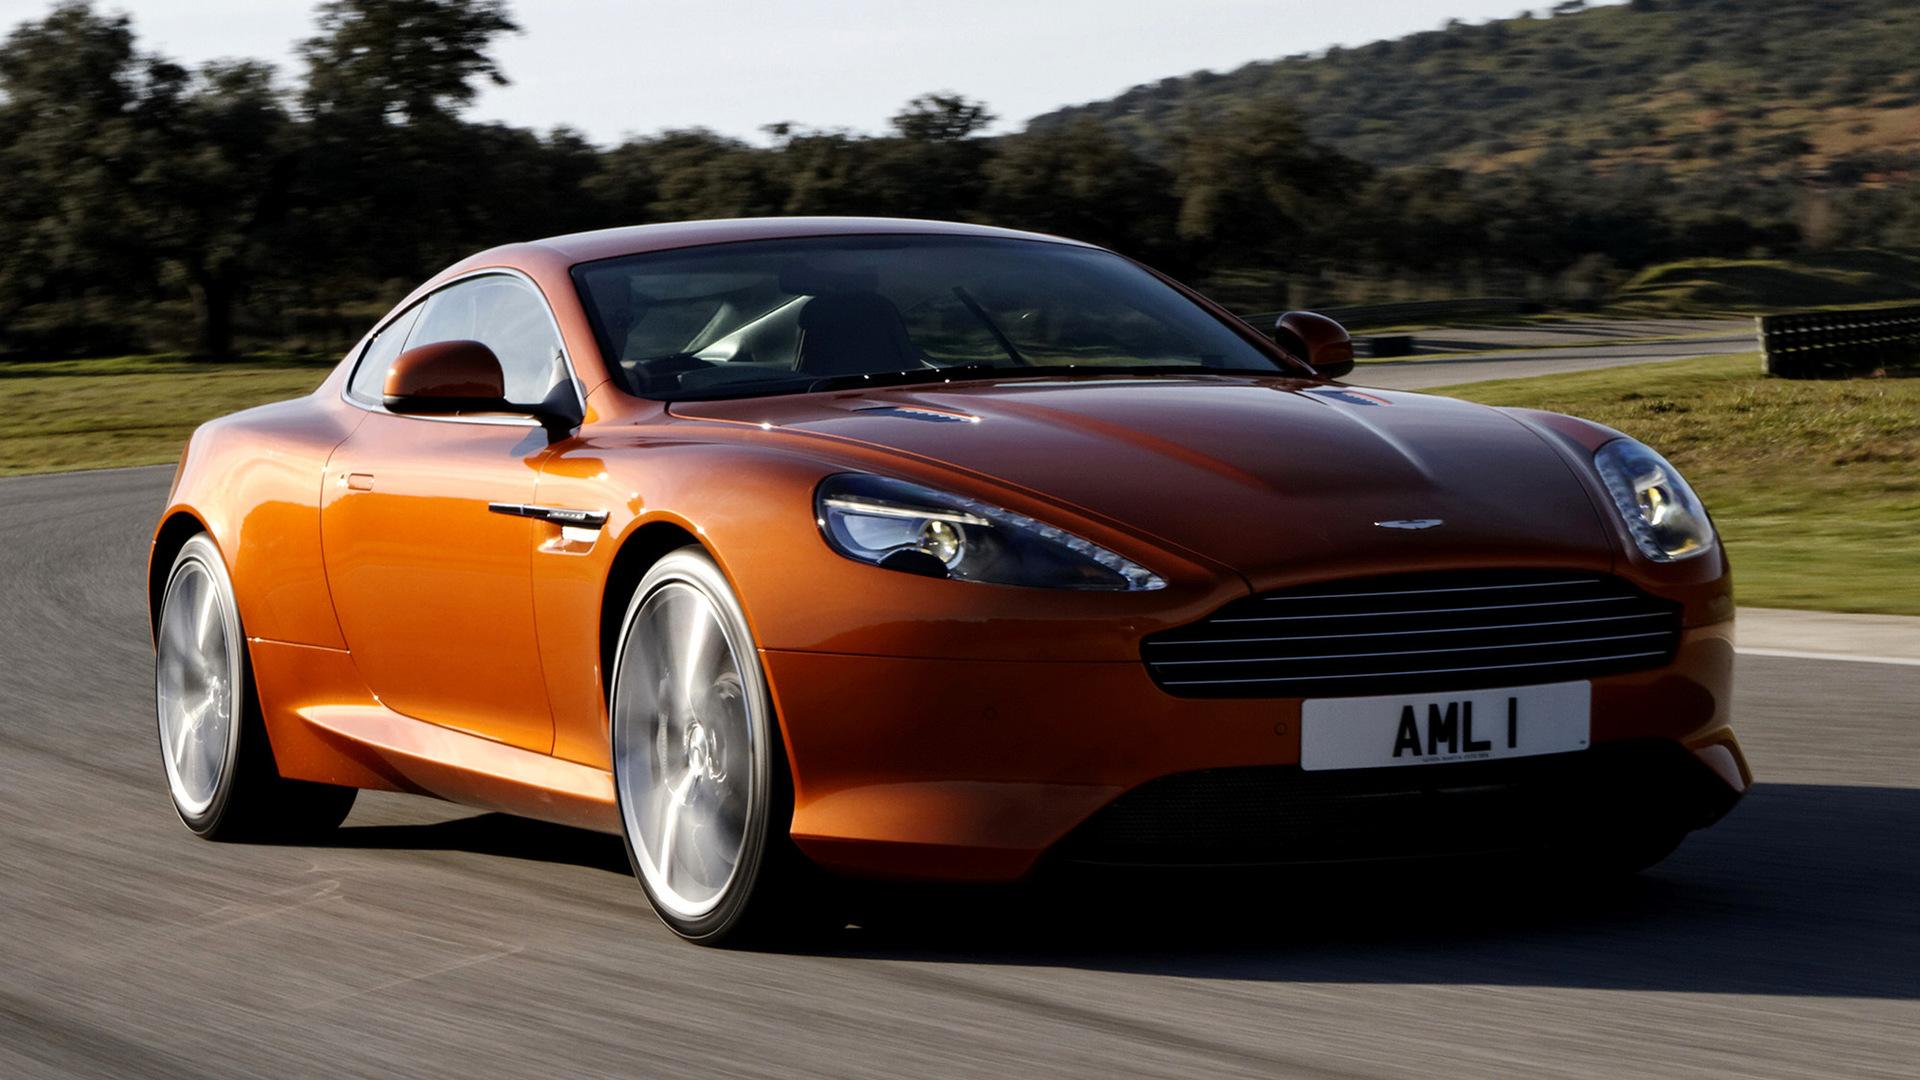 2011 Aston Martin Virage Uk Wallpapers And Hd Images Car Pixel